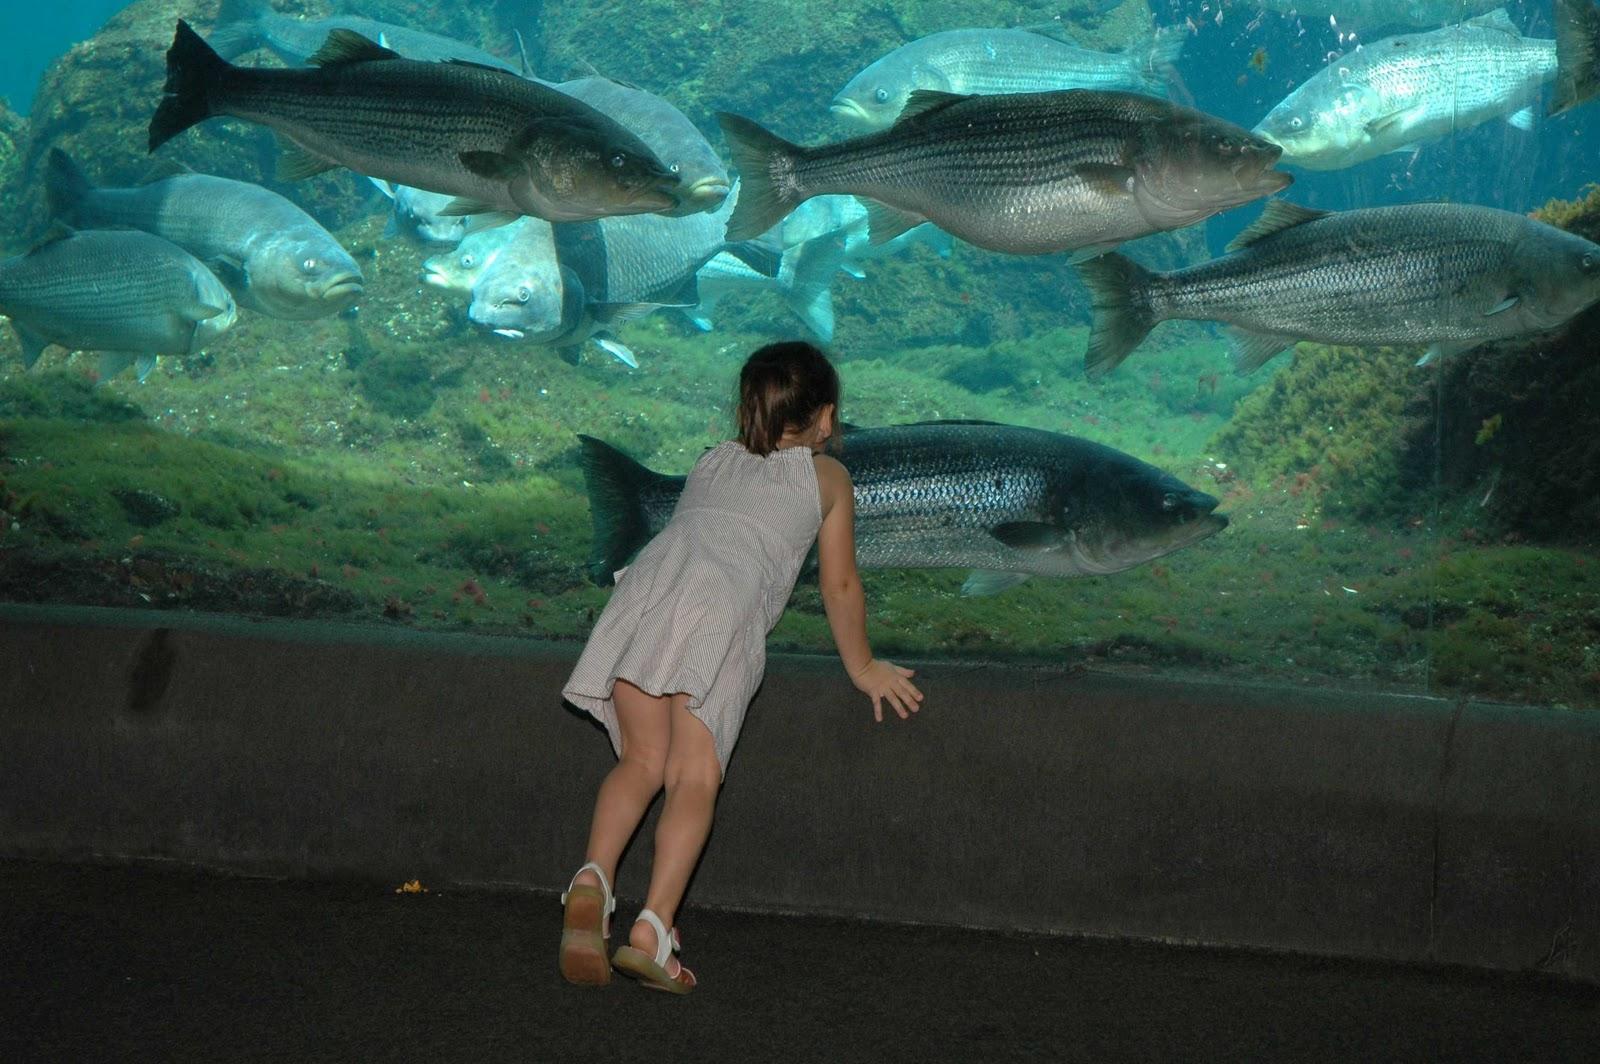 New York History Geschichte New York Aquarium 2